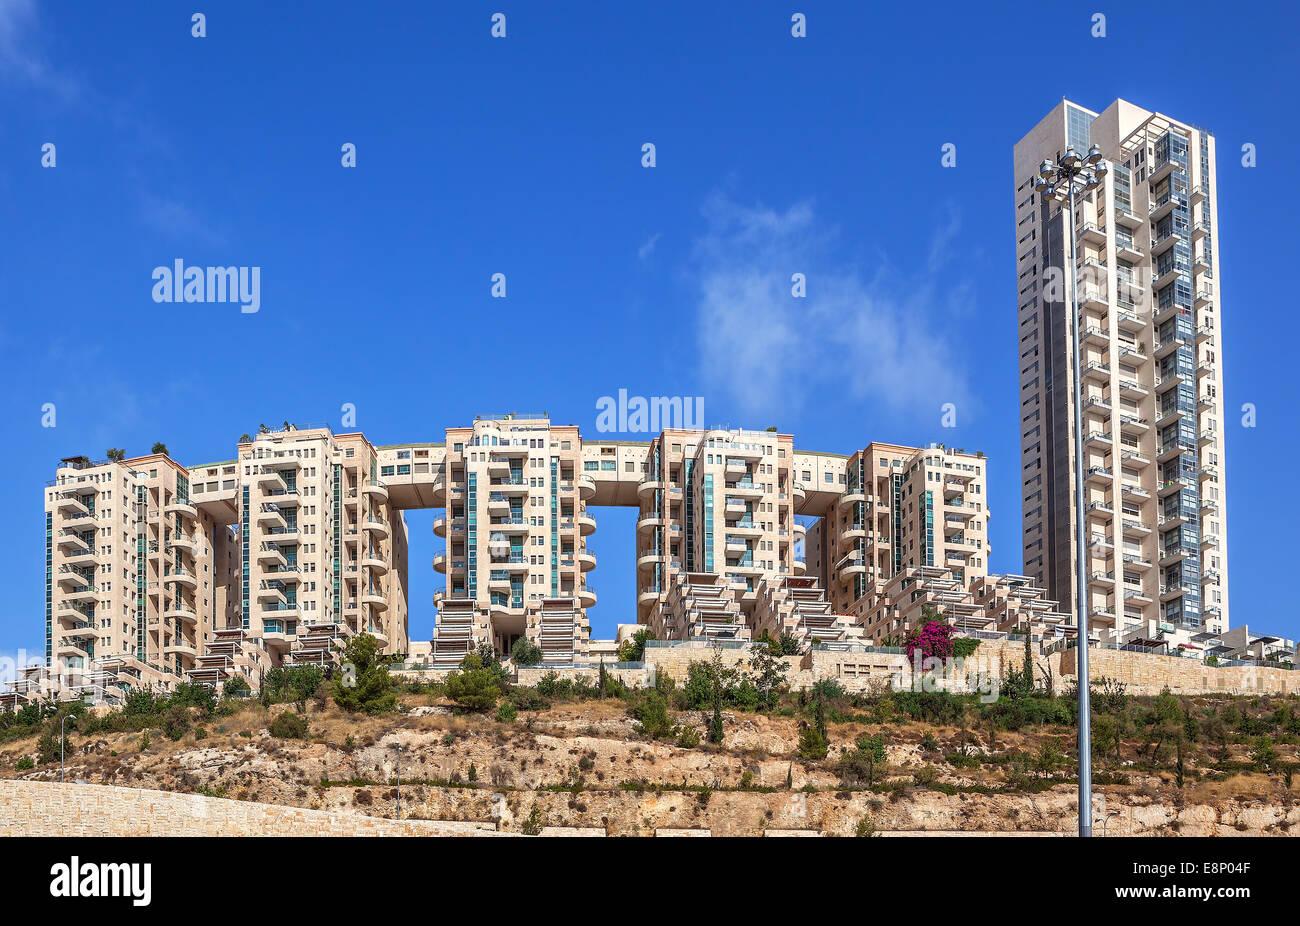 Moderne Wohnanlage unter blauem Himmel in Jerusalem, Israel. Stockbild